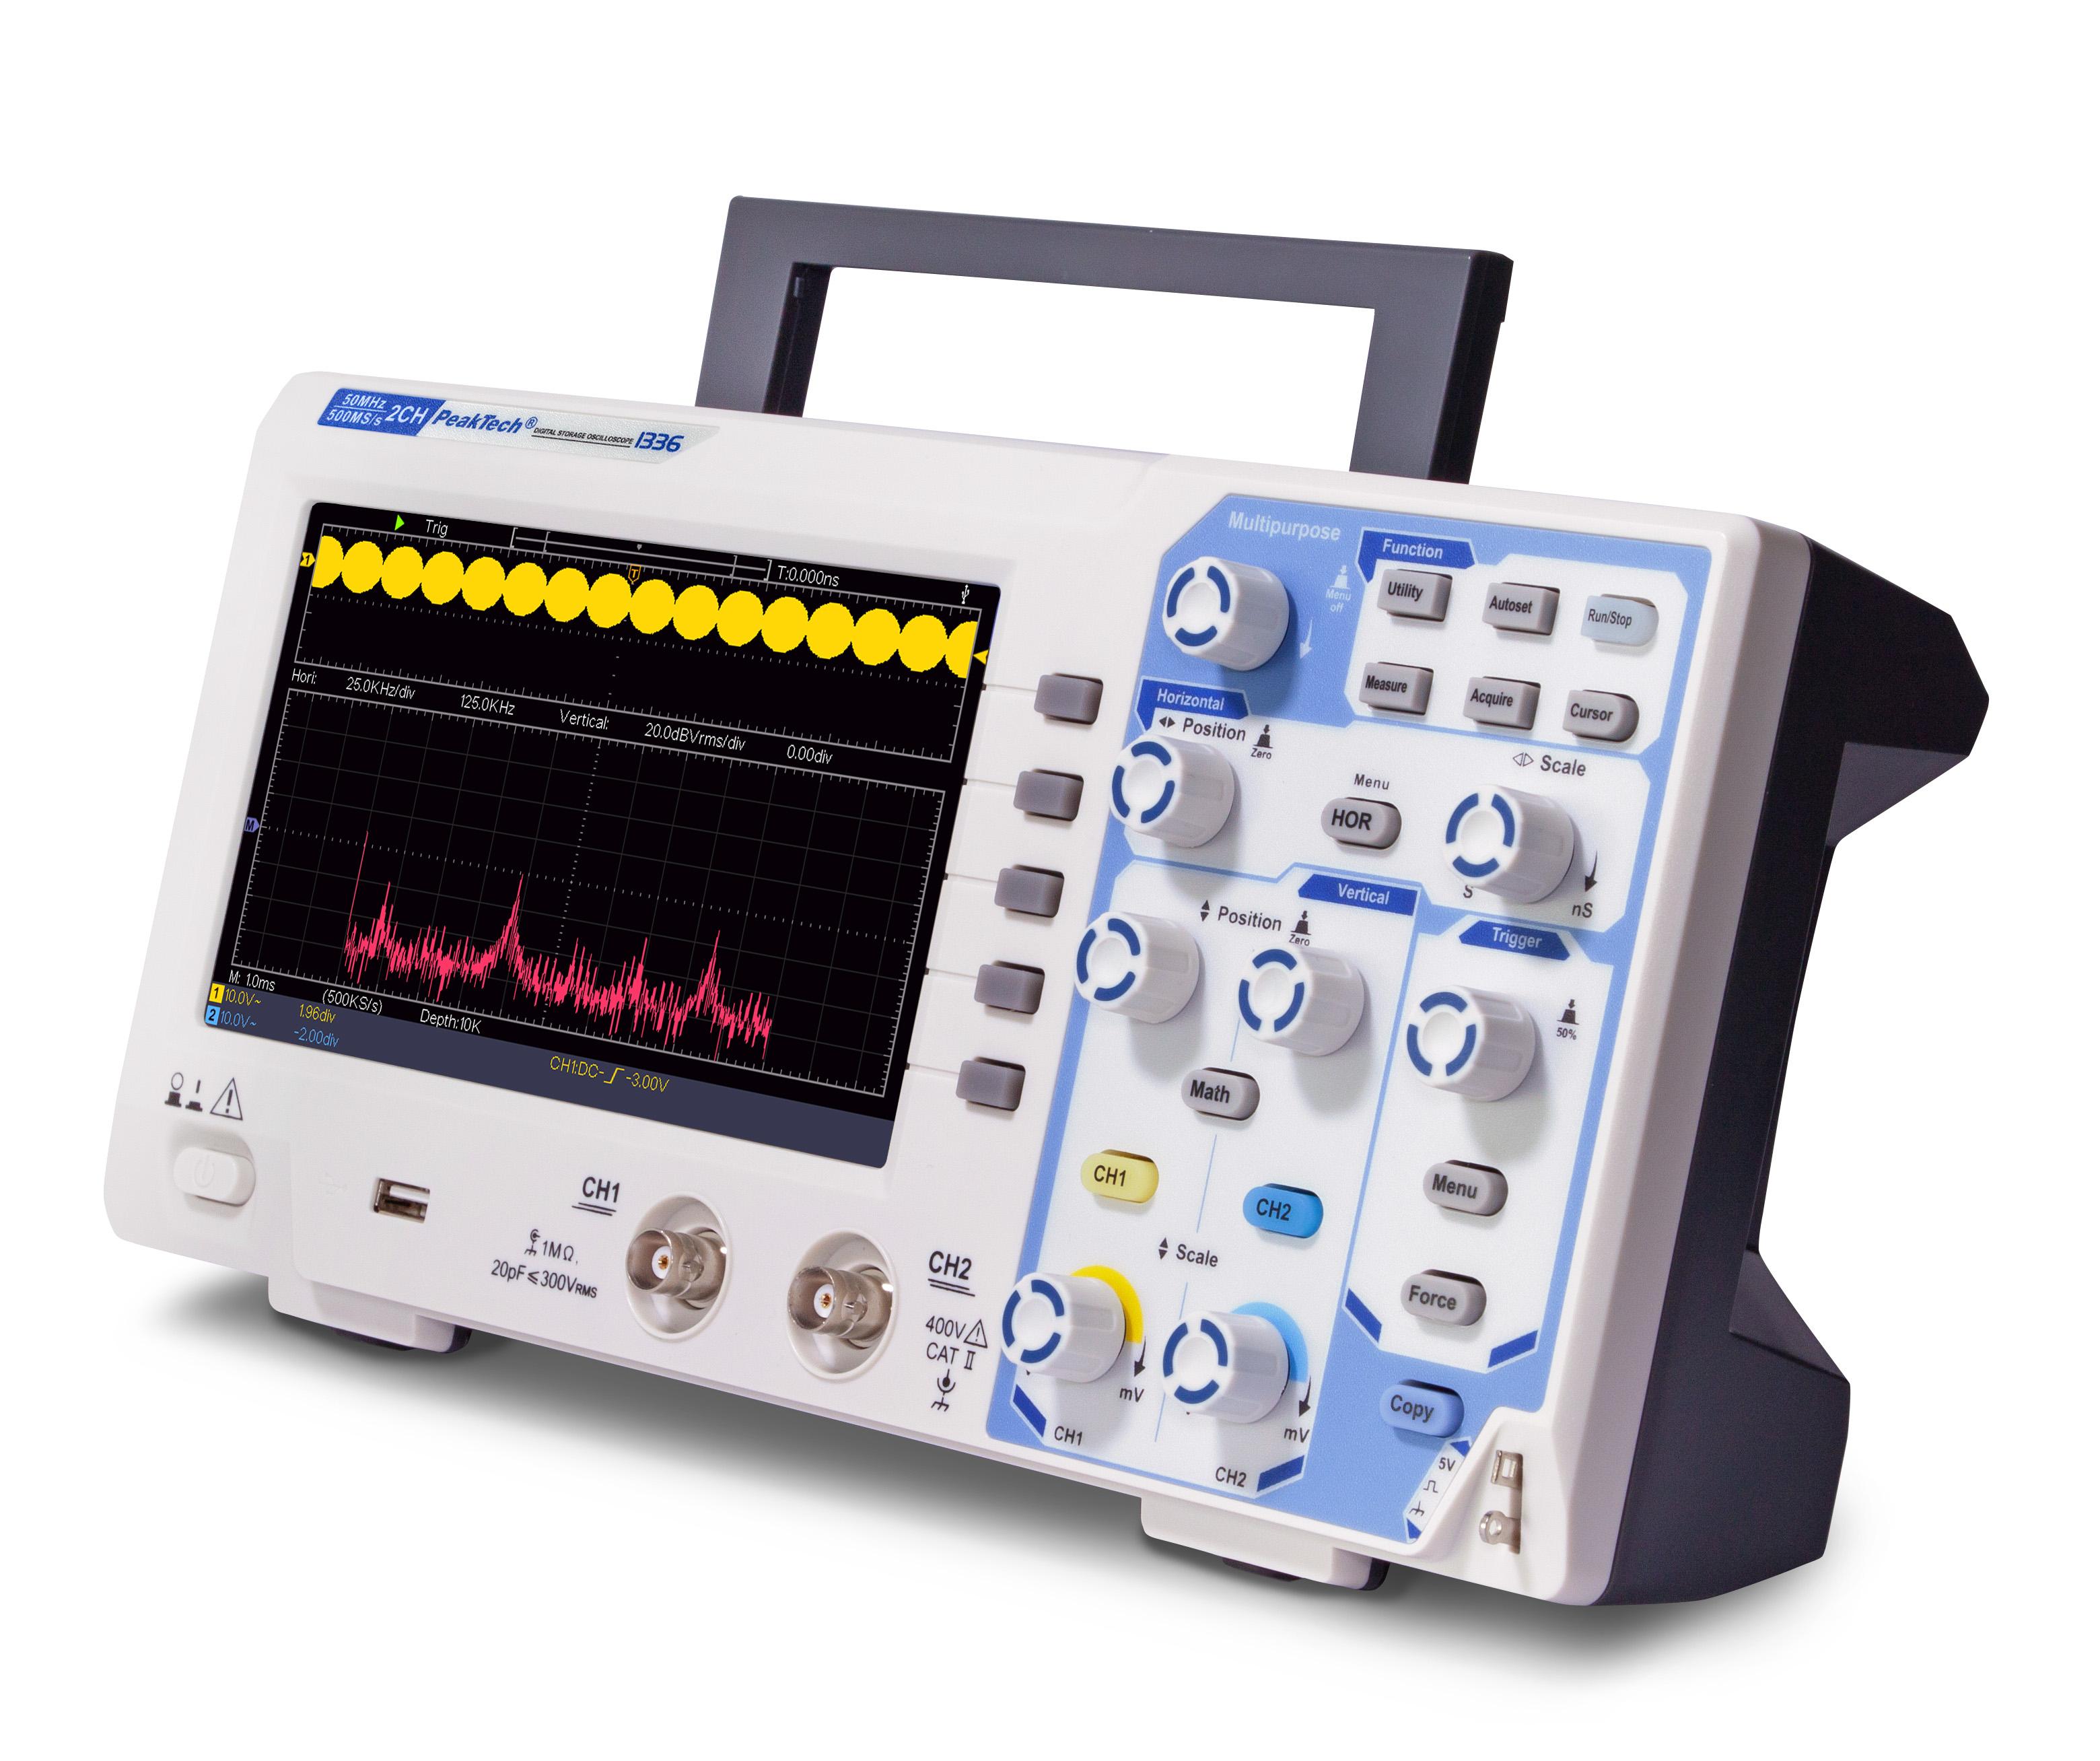 «PeakTech® P 1336» 50 MHz/2 CH, 500 MS/s digital storage oscilloscope